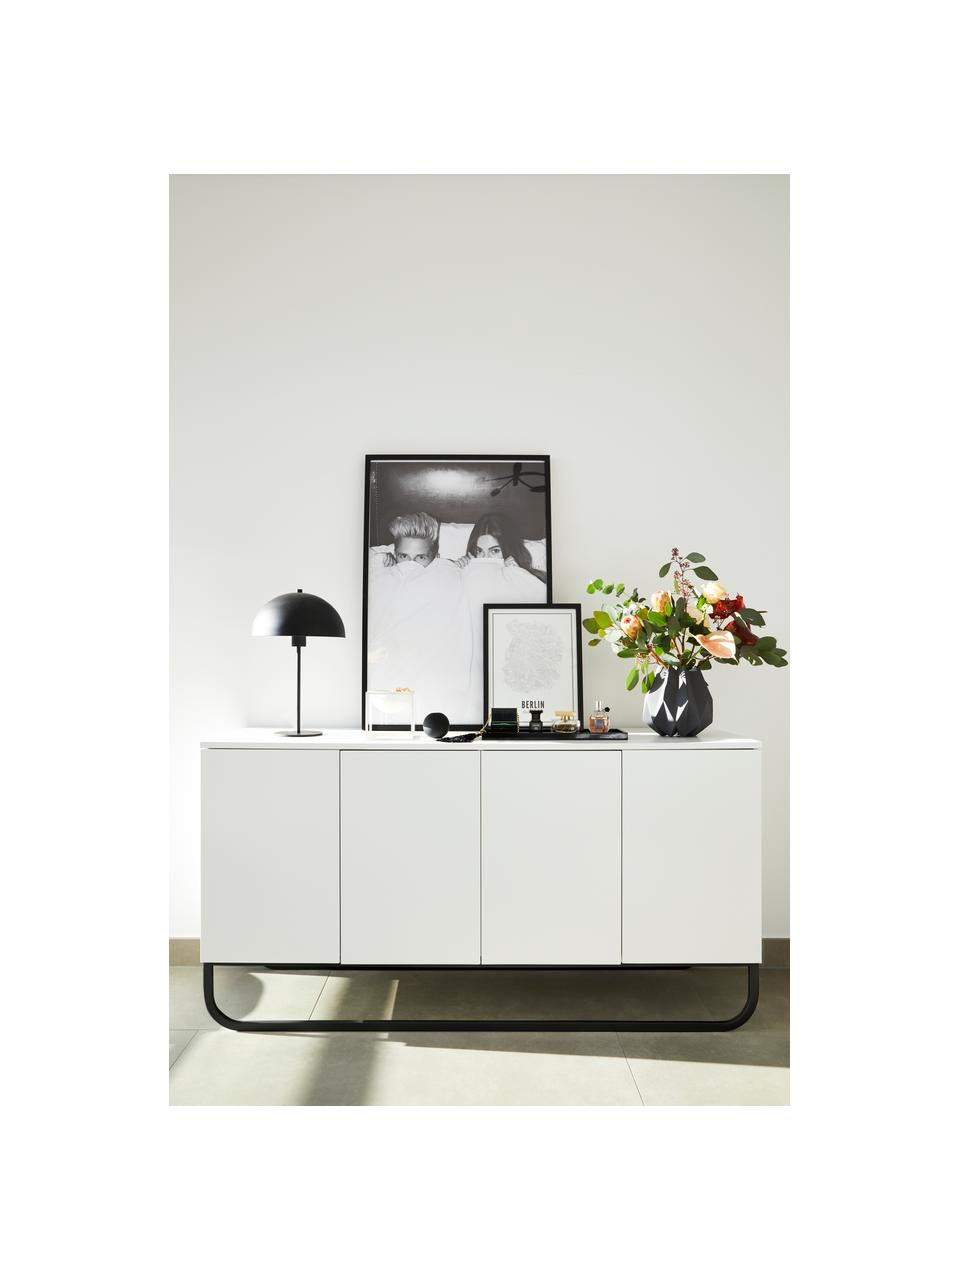 Credenza bianca con ante Sanford, Bianco, nero, Larg. 160 x Alt. 83 cm